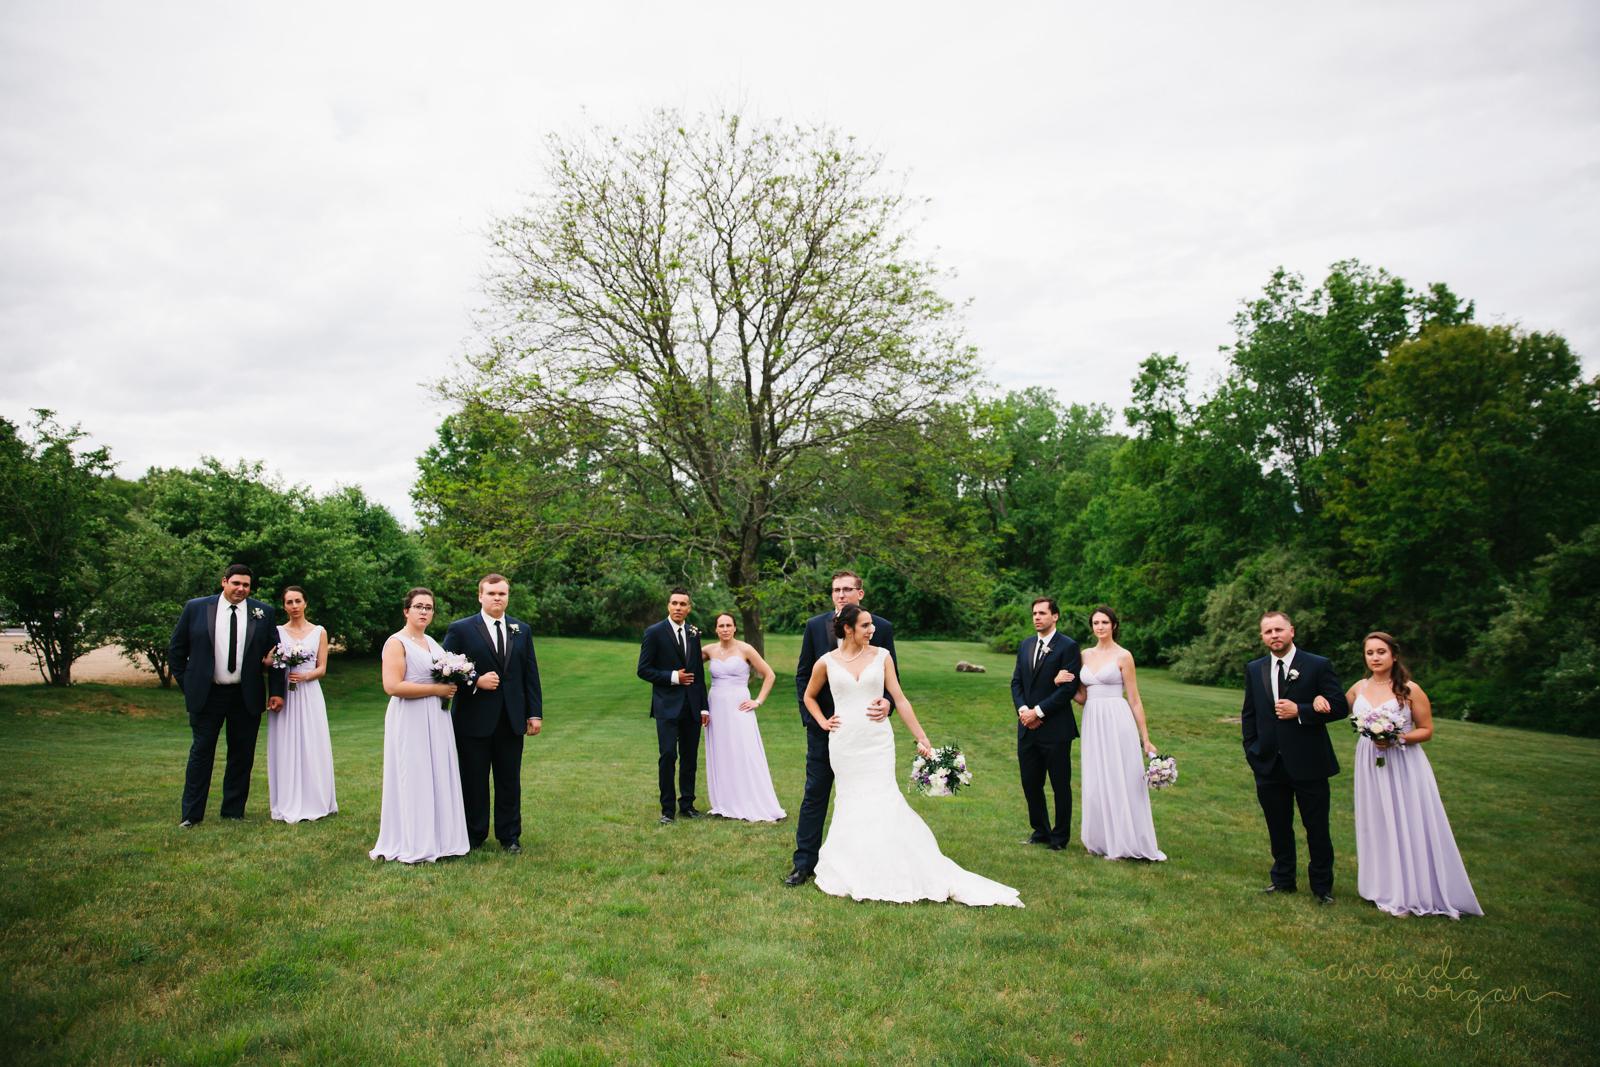 Publick-House-Wedding-Amanda-Morgan-44.jpg